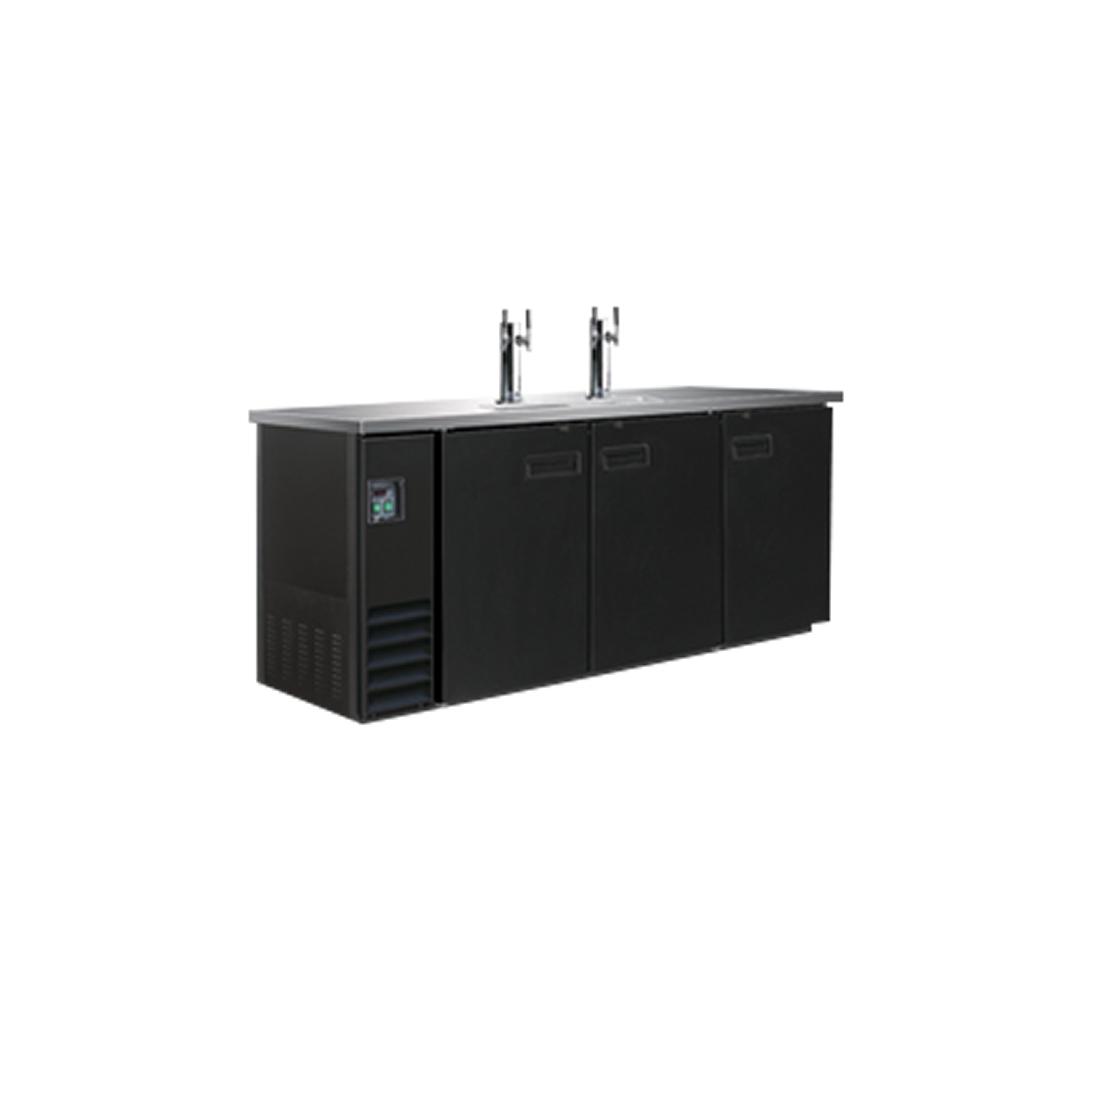 Triple Door Underbar direct draw dispenser 3-barrel - UBD-3